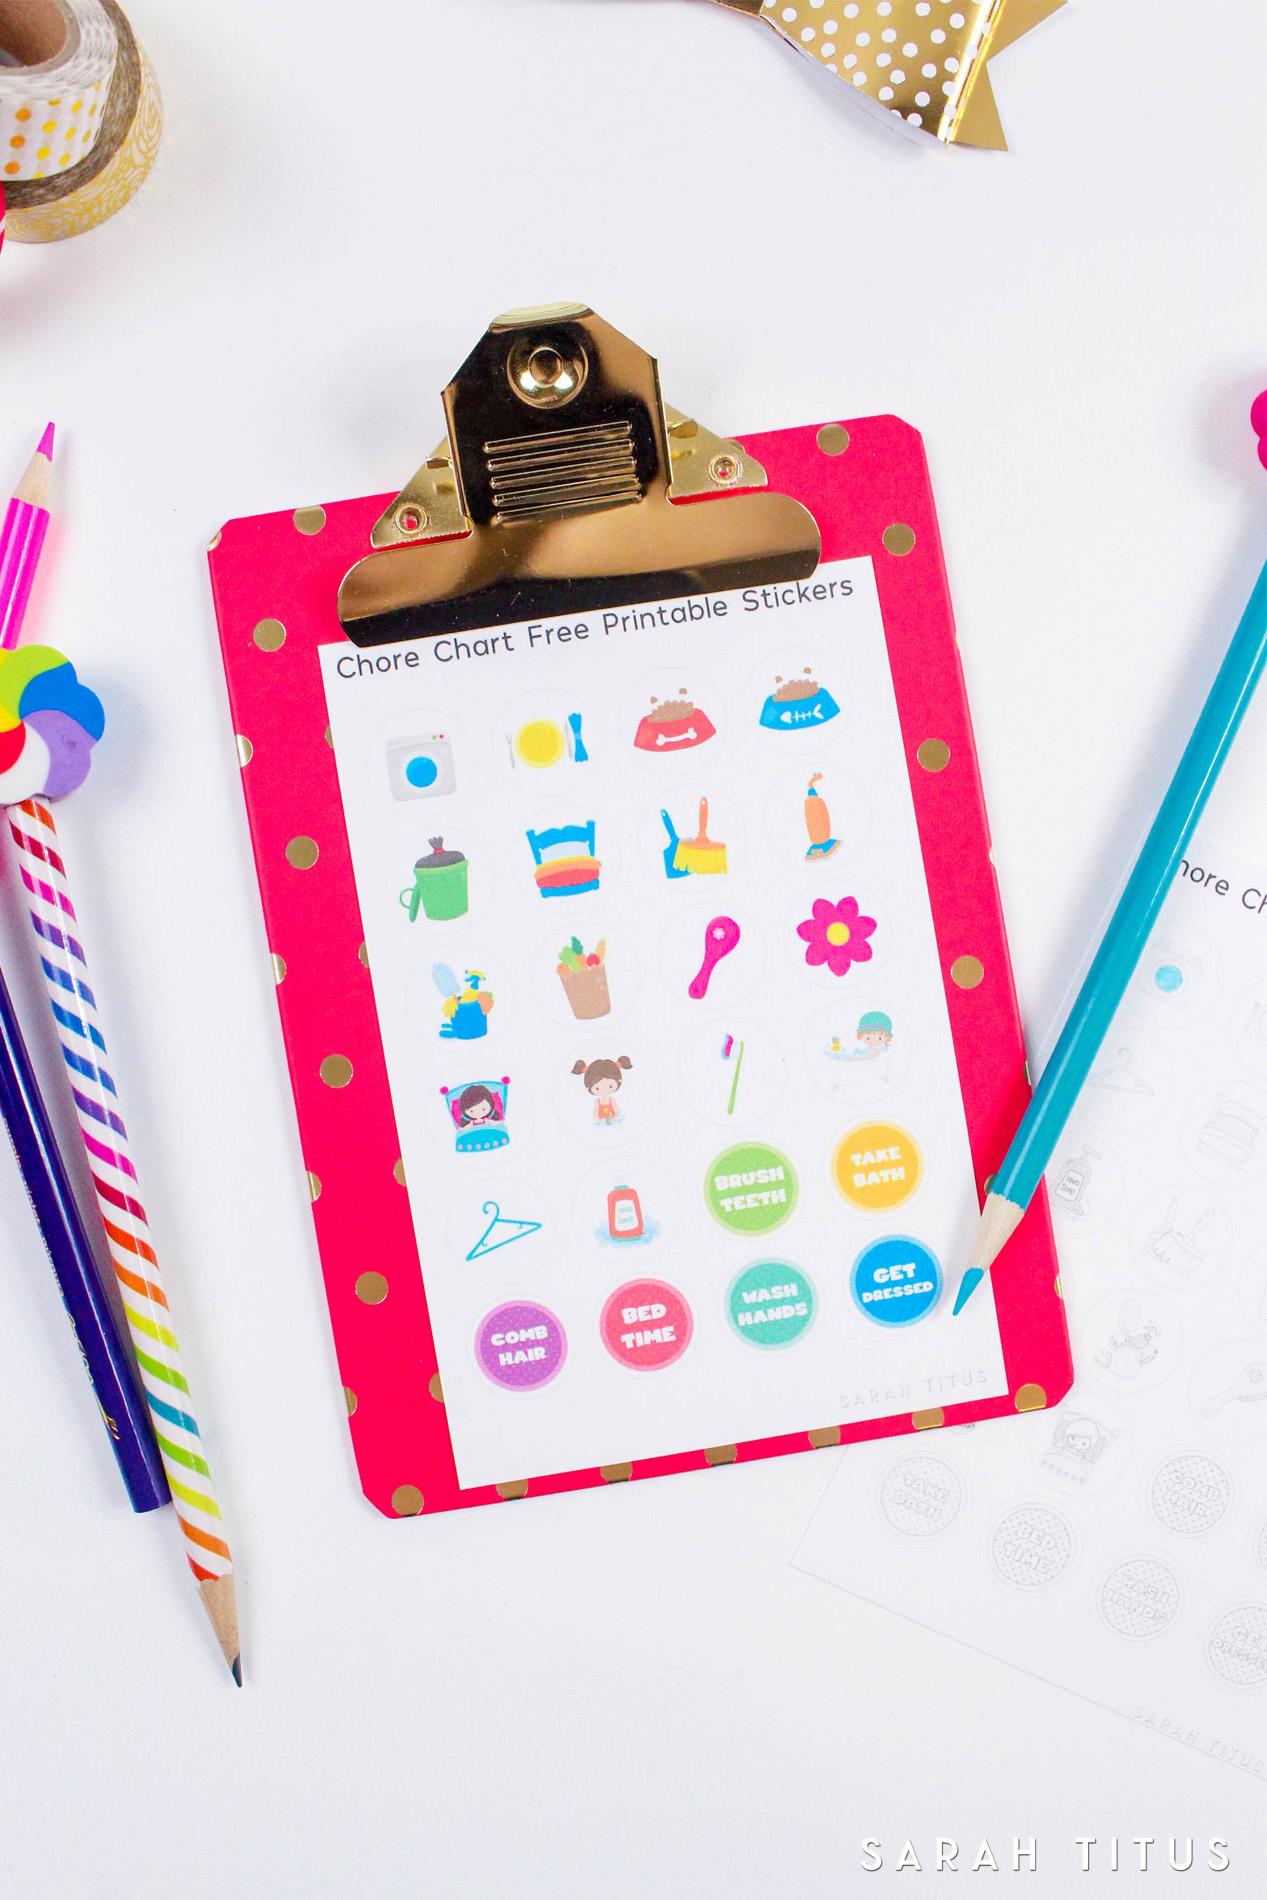 Free Printable Chore Chart Stickers - Sarah Titus - Chore Stickers Free Printable